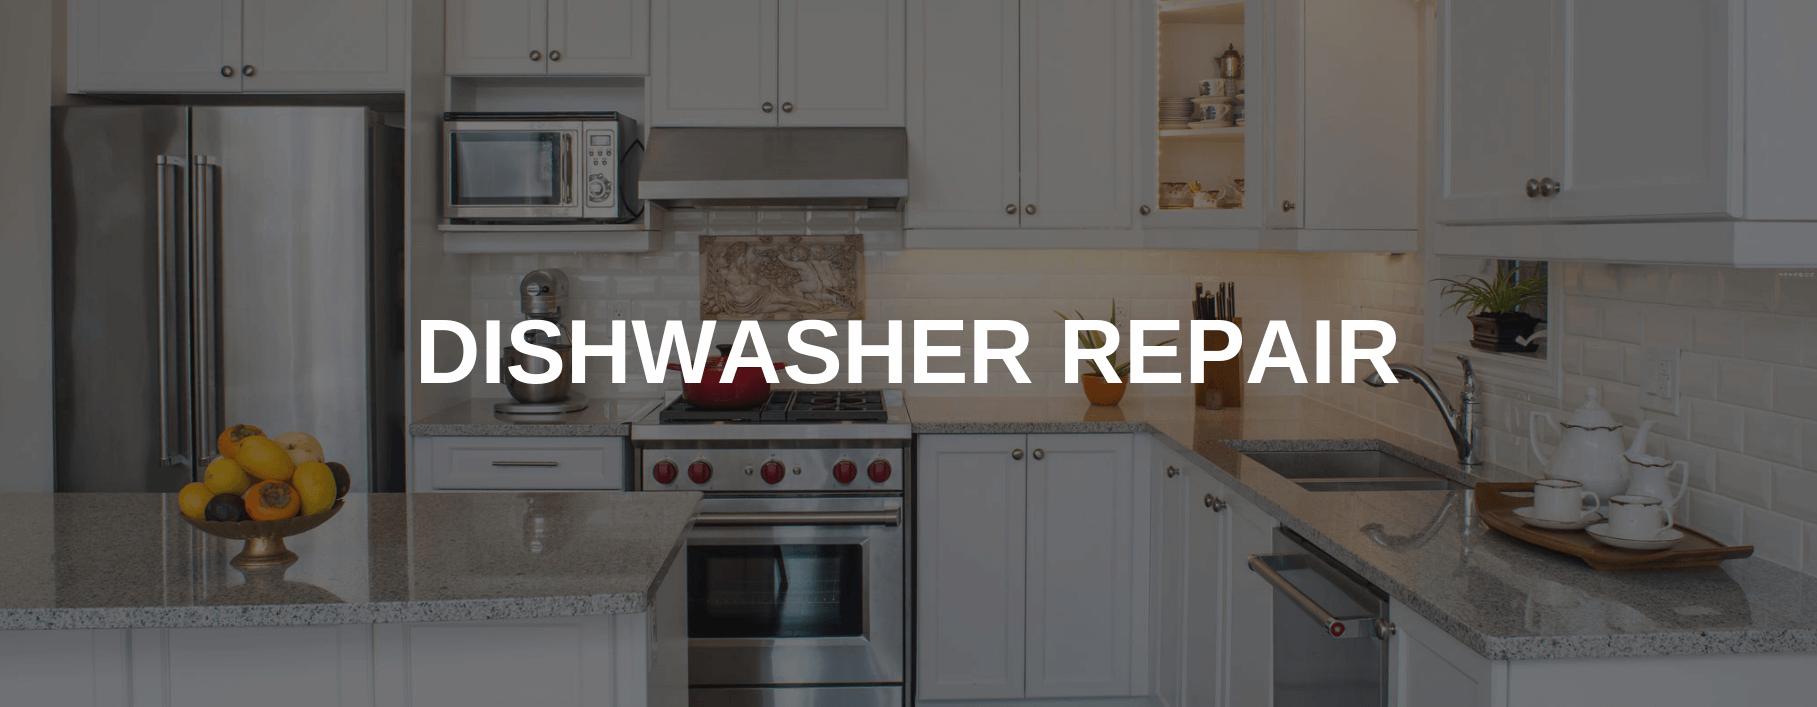 dishwasher repair oakland